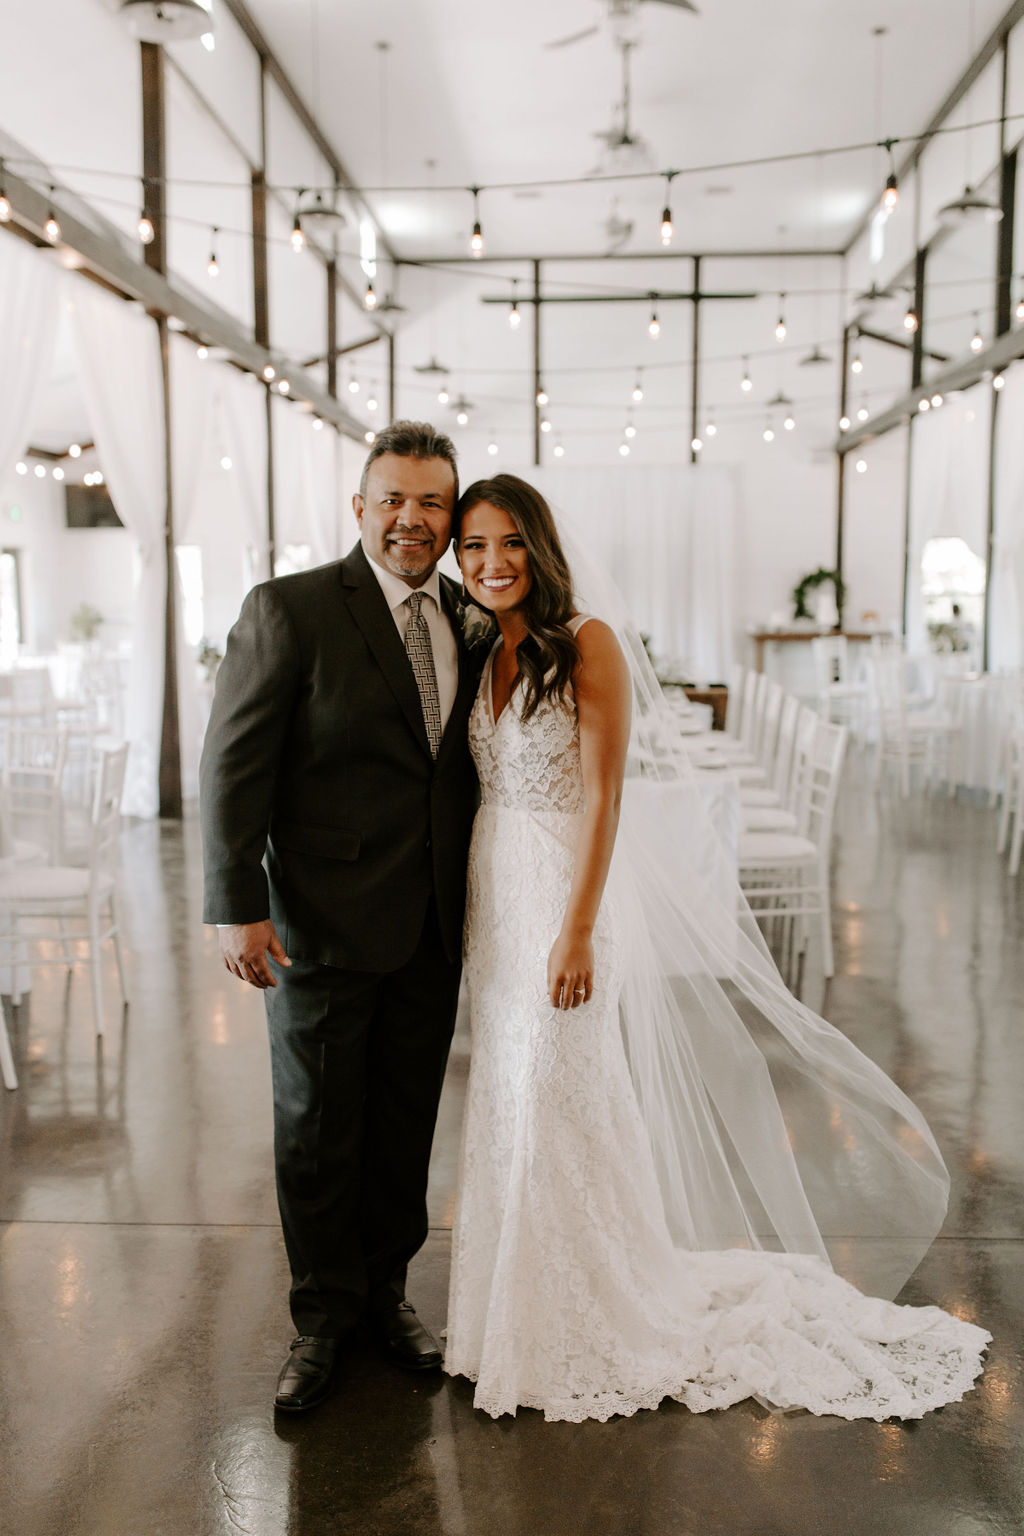 Tulsa White Barn Wedding Venue Outdoor Ceremony 33.jpg